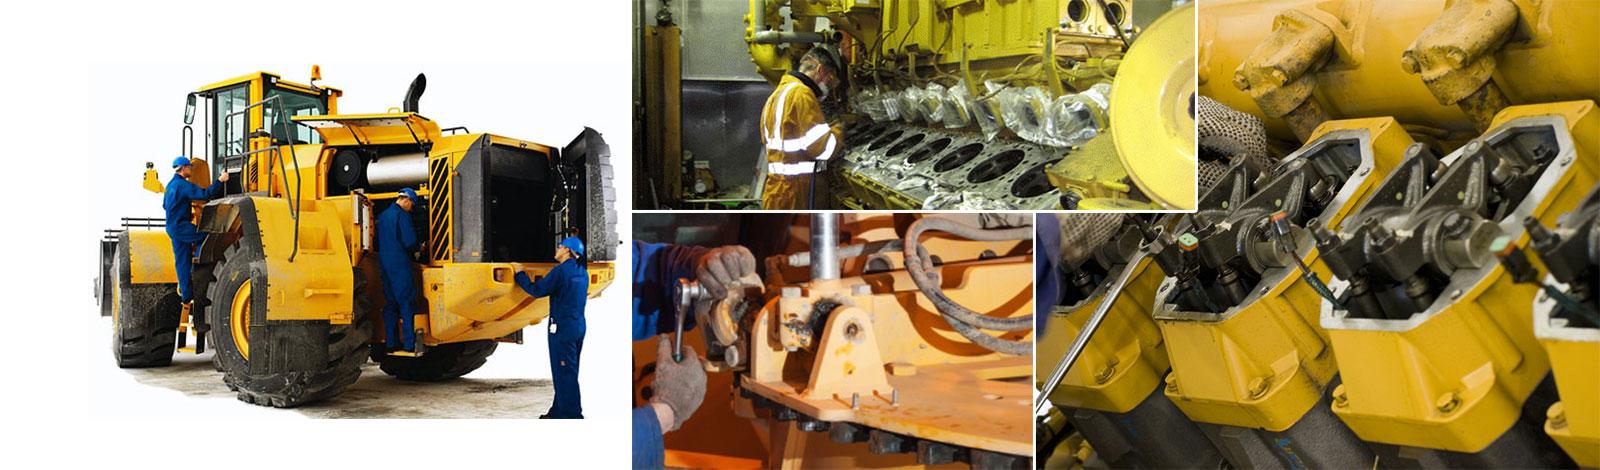 mining-equipment-maintenance-team